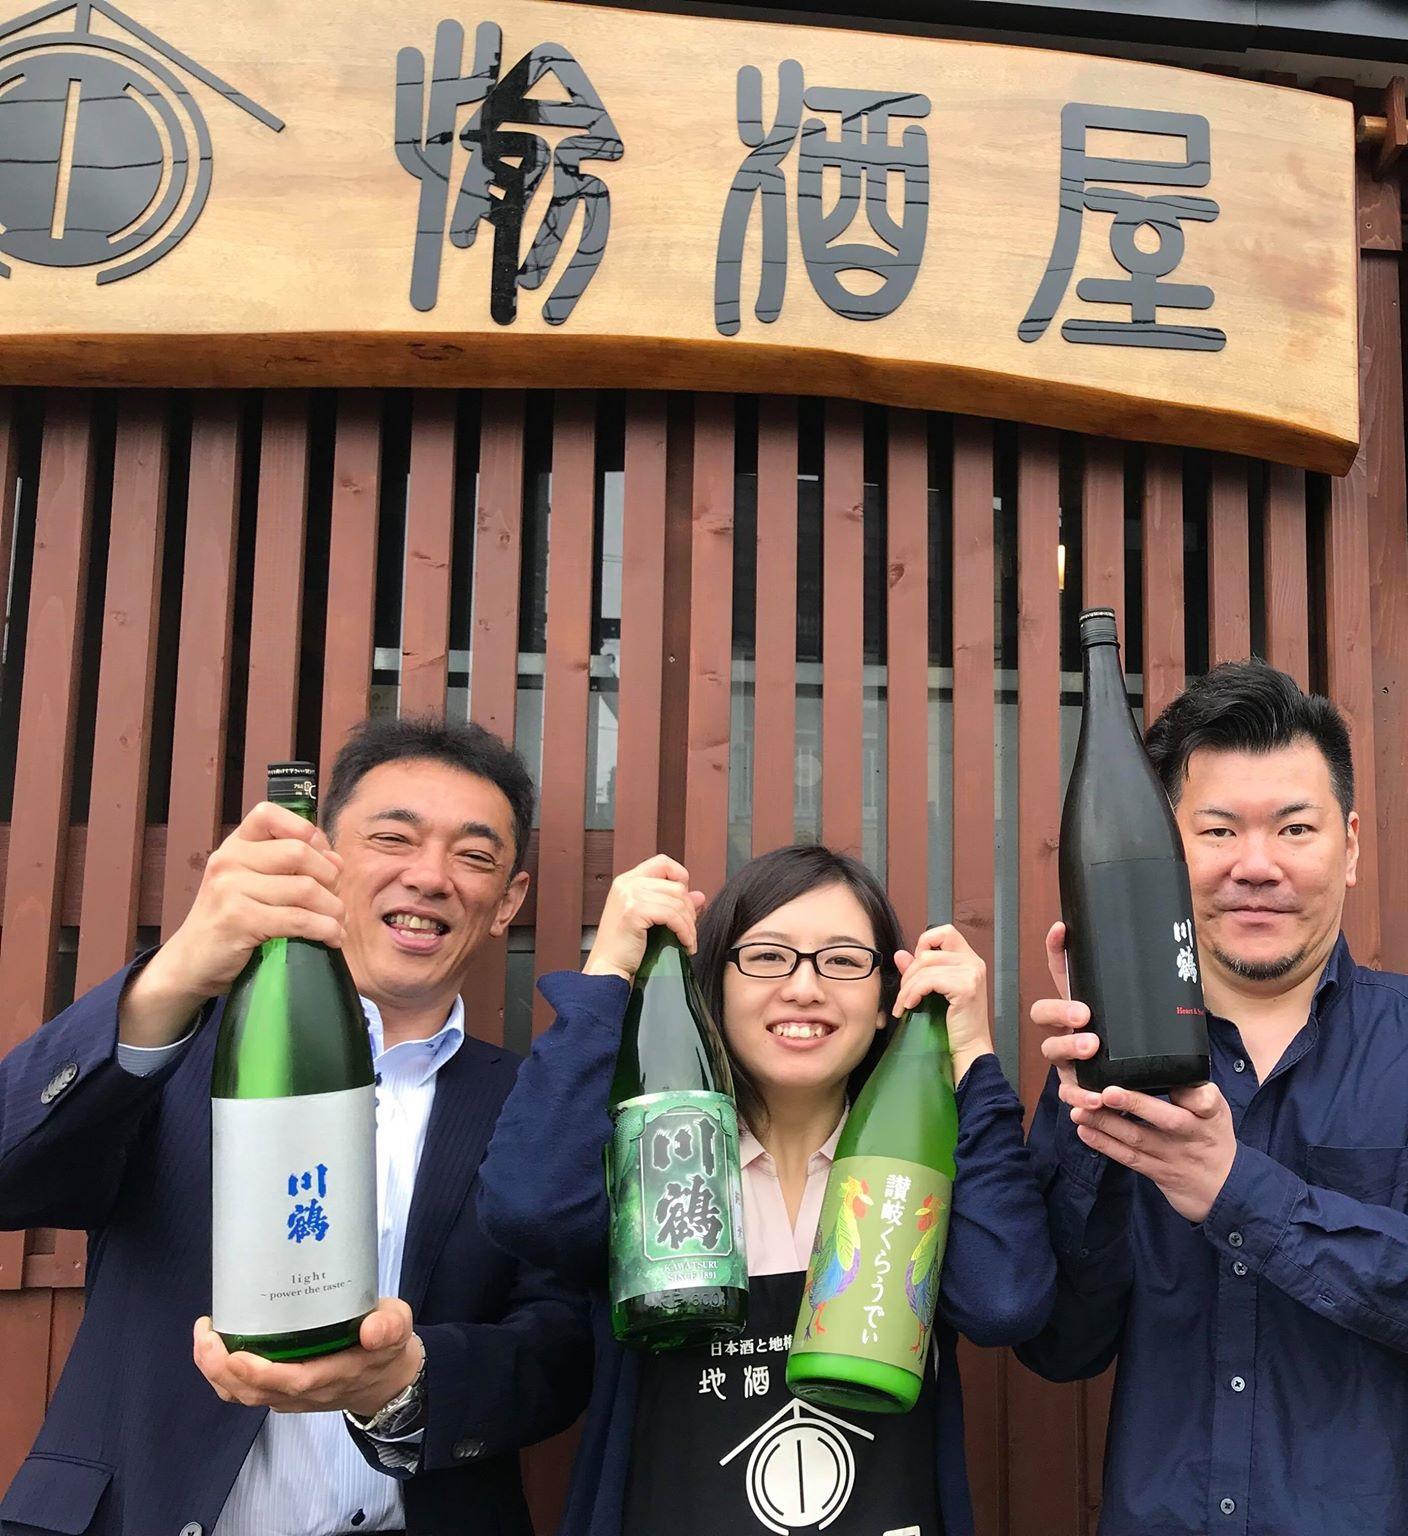 【日本酒】川鶴 特別純米 無濾過生原酒 オオセト55磨き Clear Bottle 限定 令和1BY🆕_e0173738_1211058.jpg